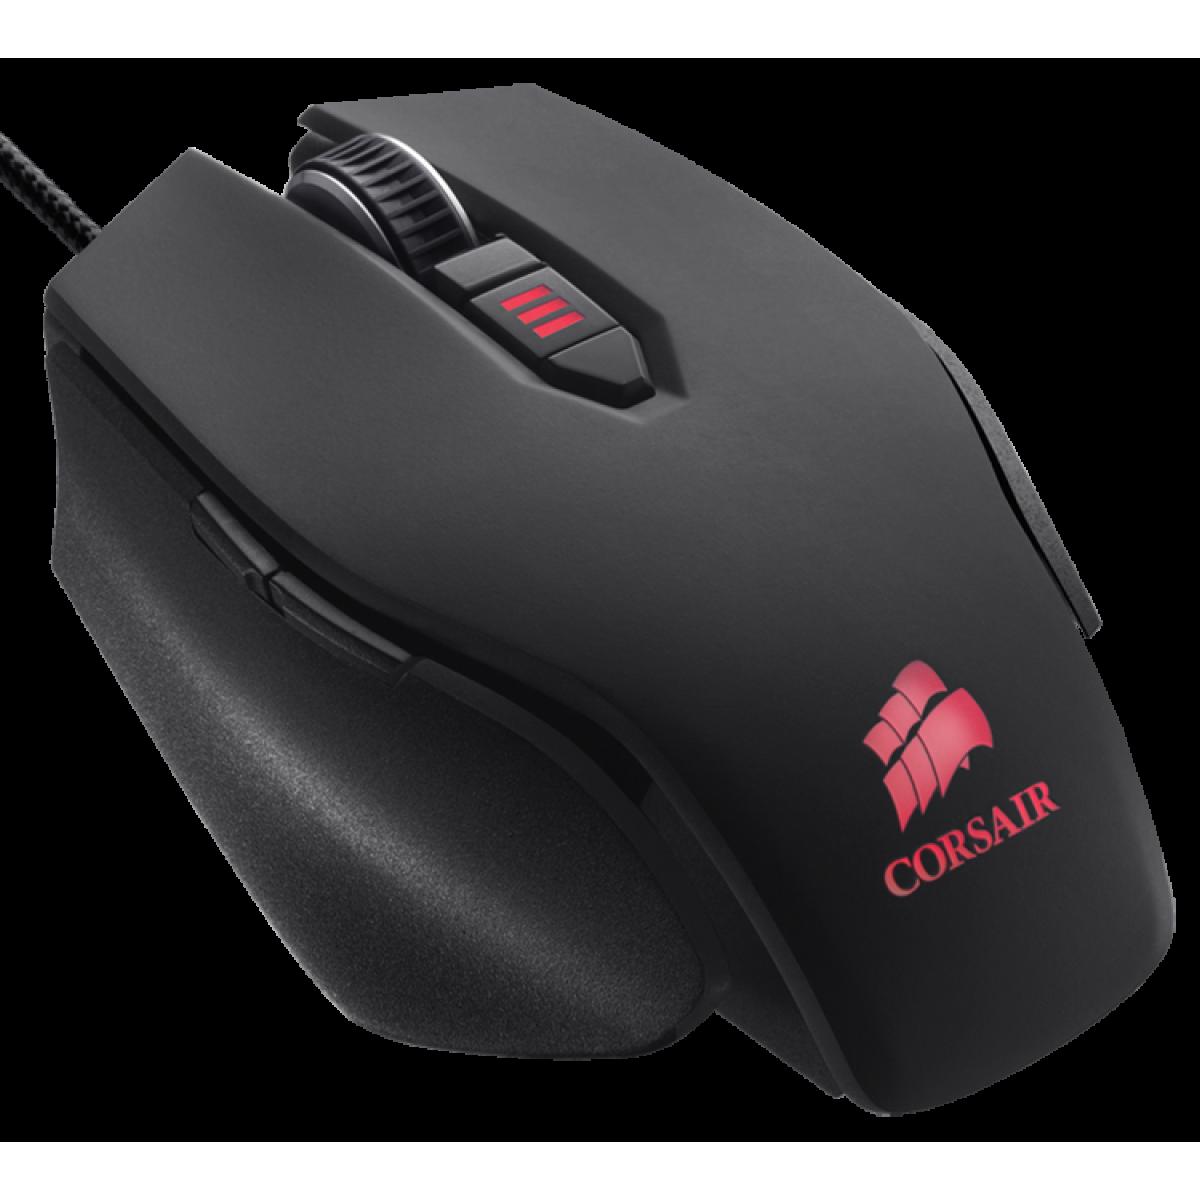 Mouse Corsair Raptor M45 CH-9000052-NA 5000DPI - USB